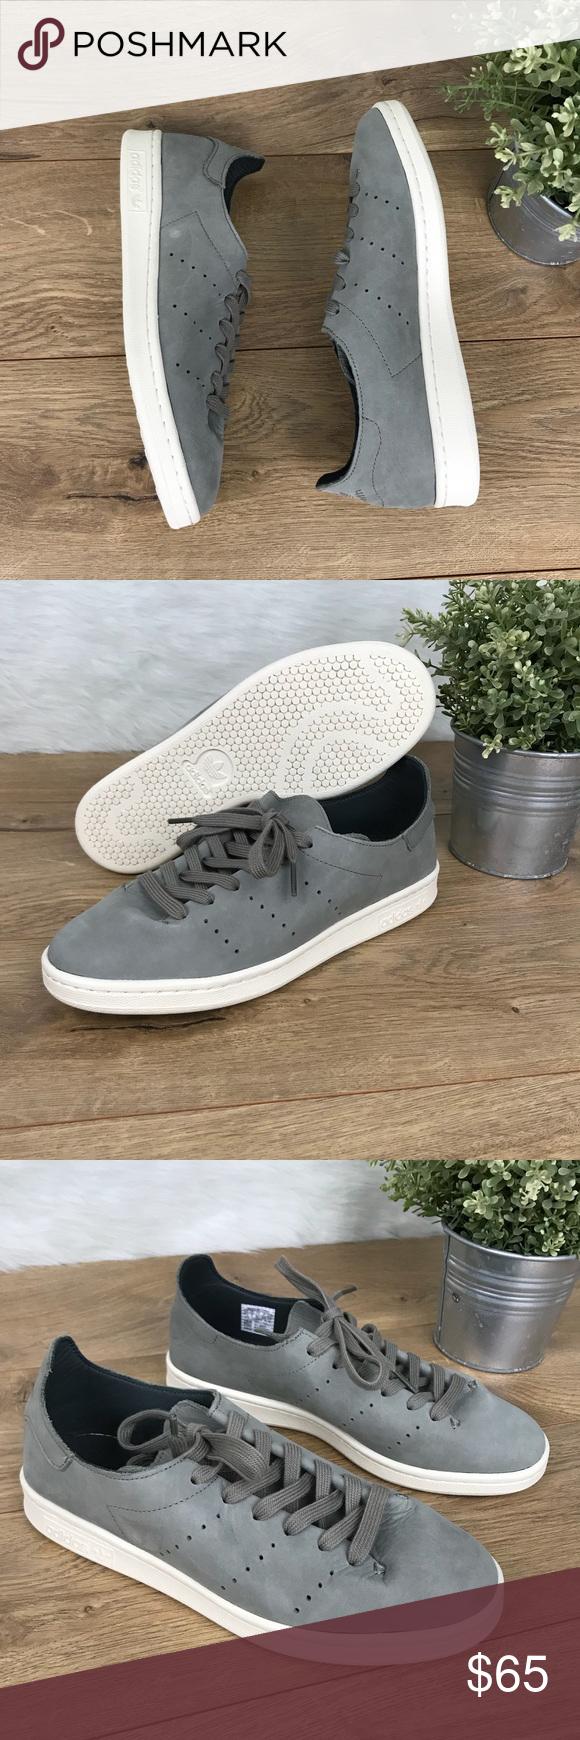 Adidas Stan Smith Leather Sock zapatilla NWT mi Posh Picks